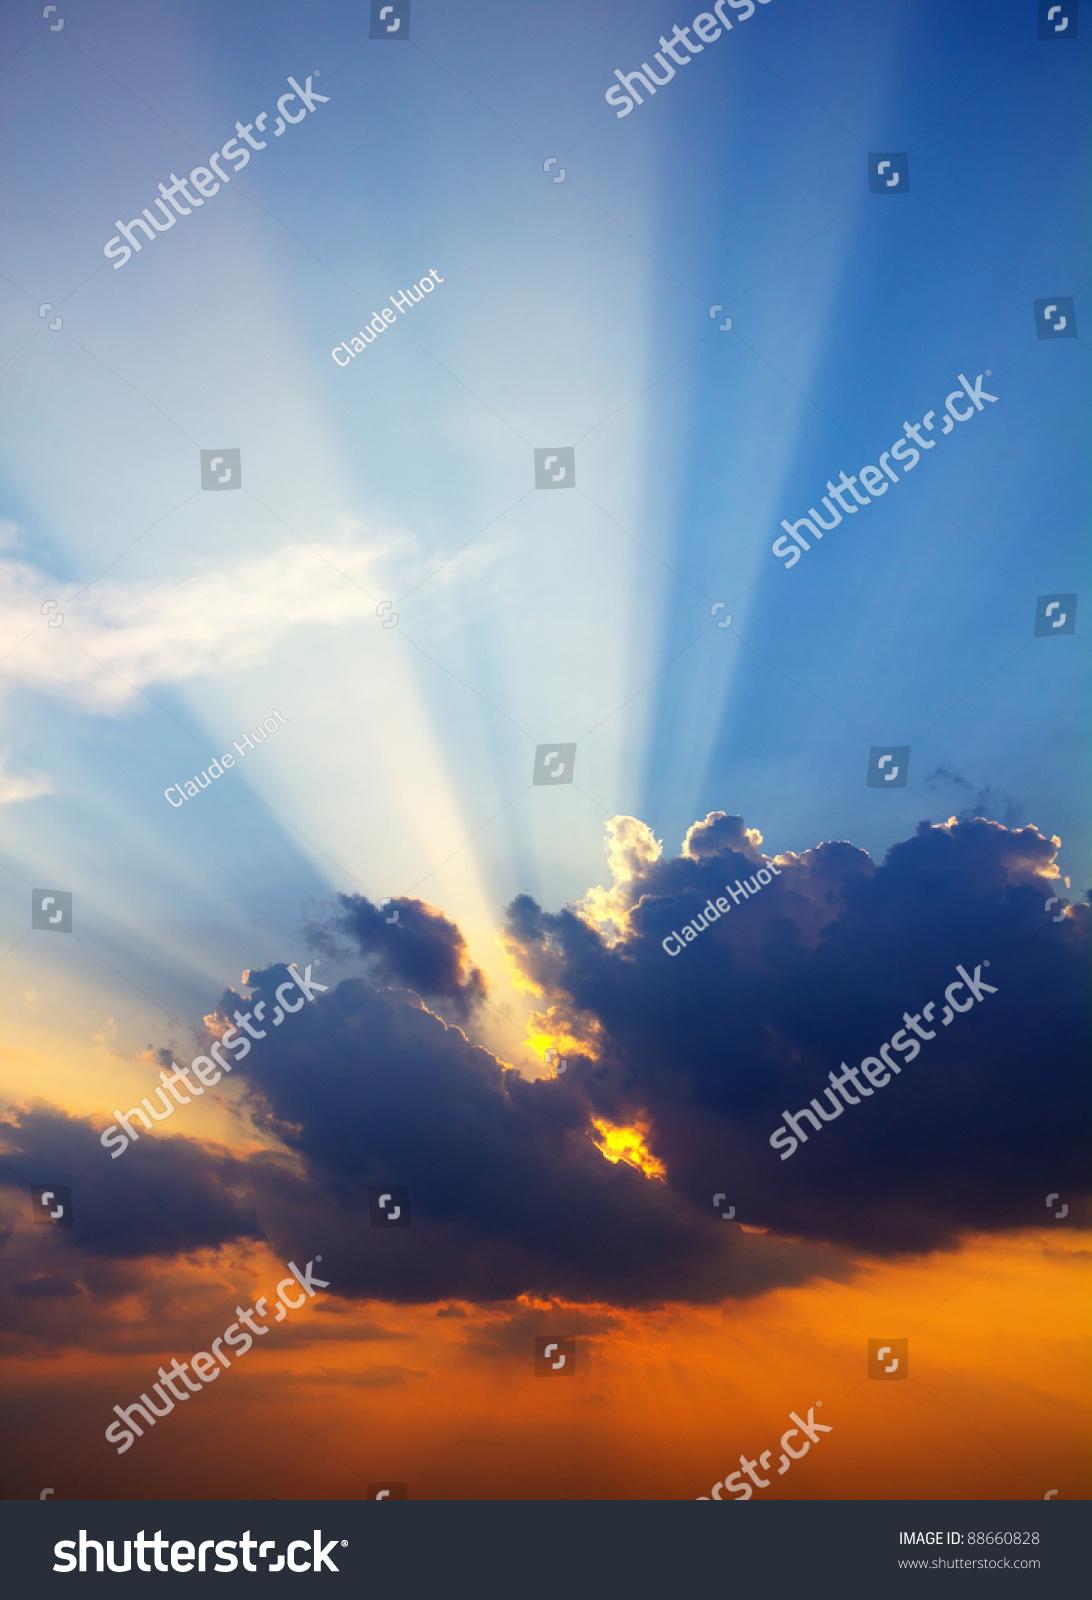 Sun rays through clouds at sunset